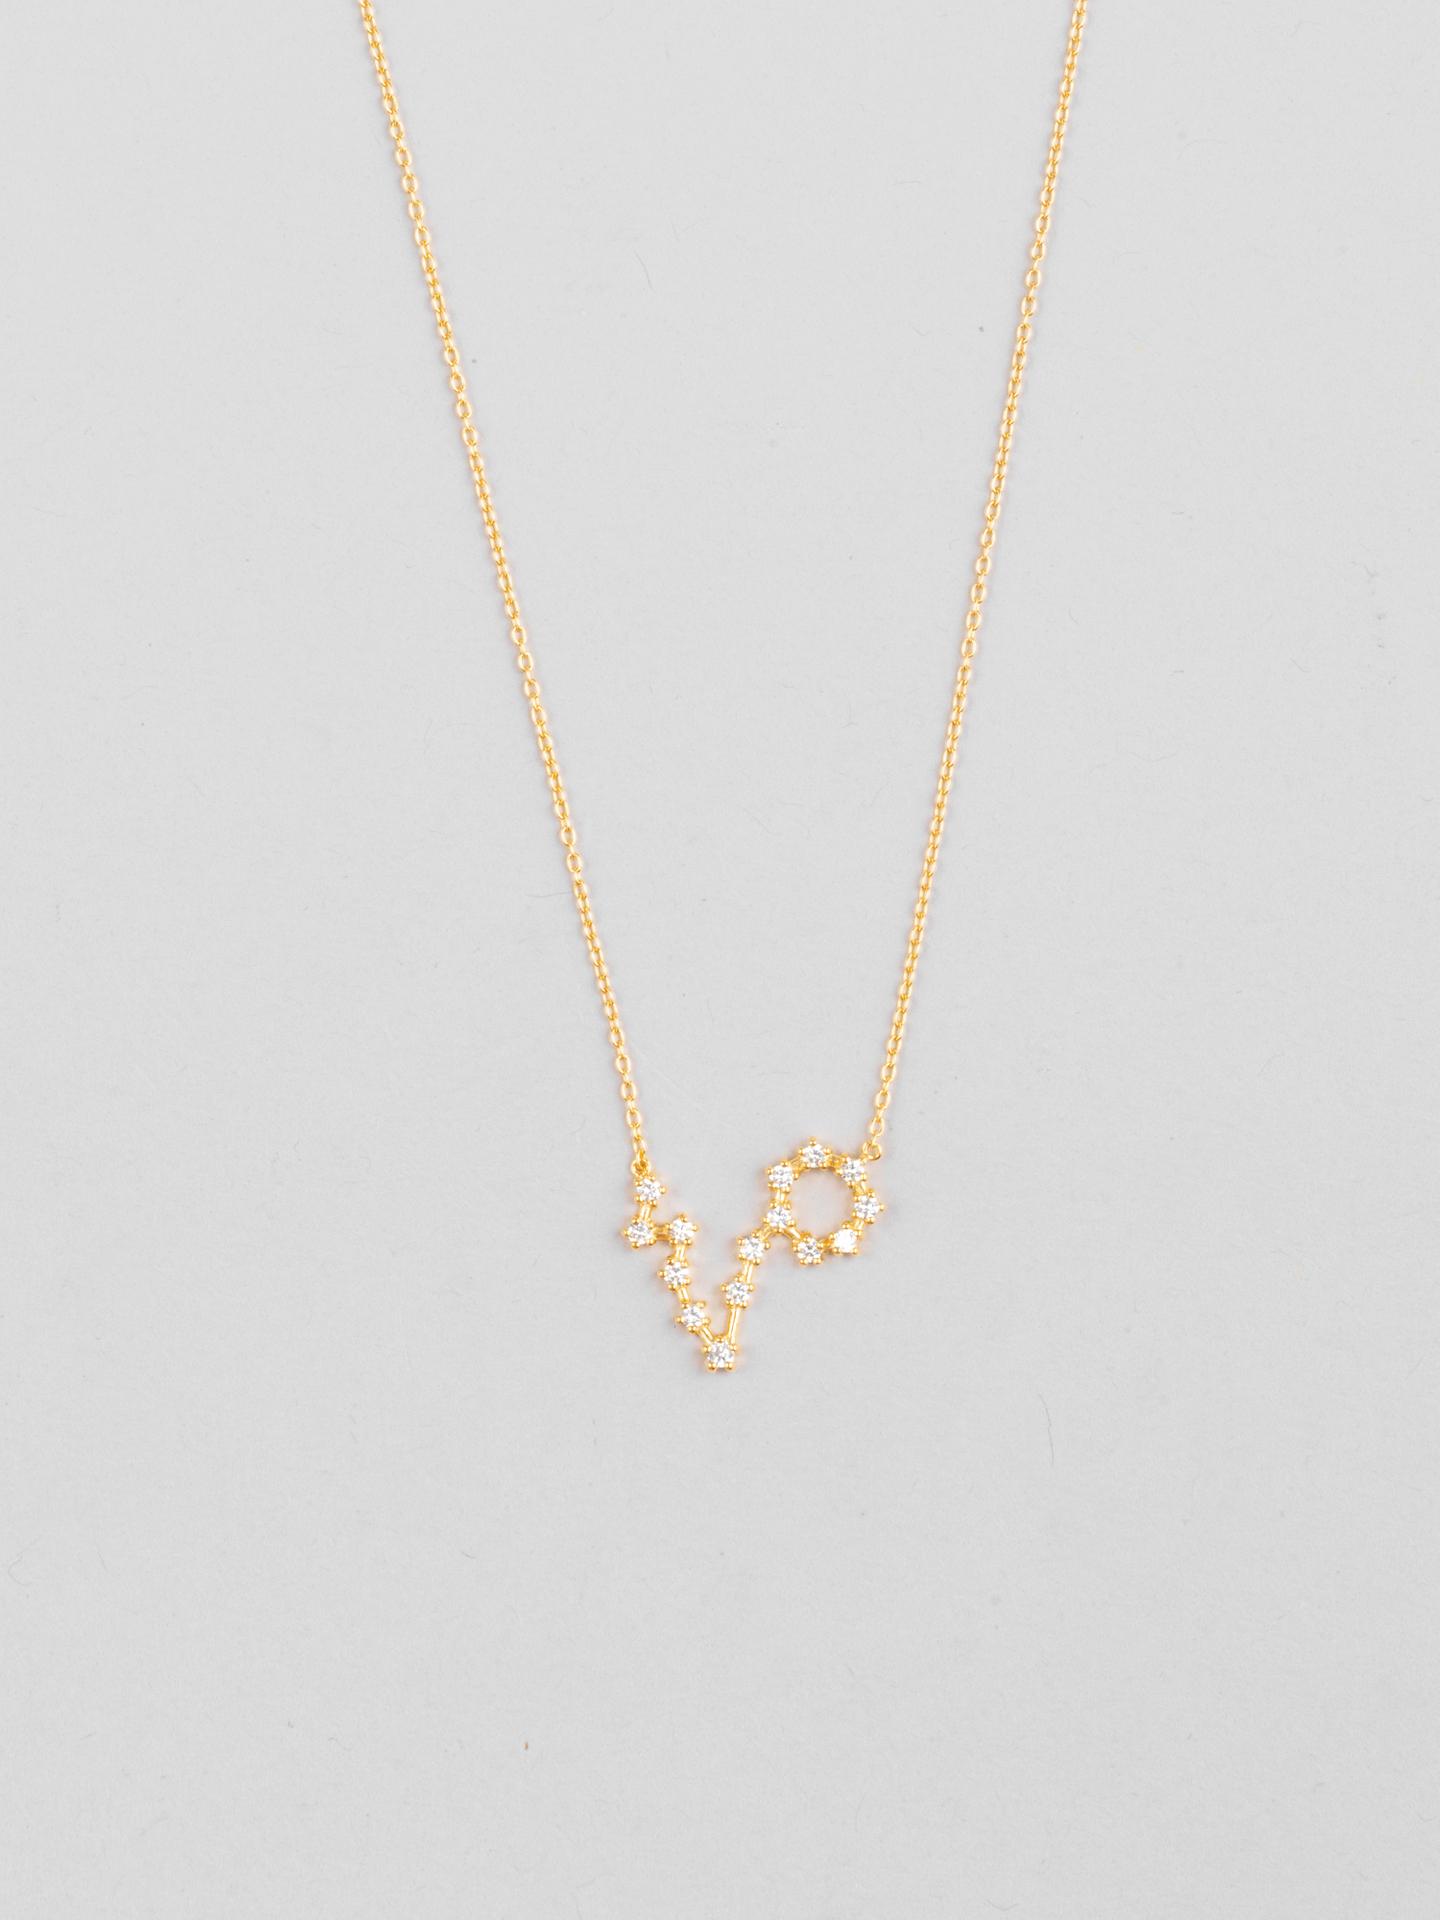 Pisces Zodiac Constellation Necklace